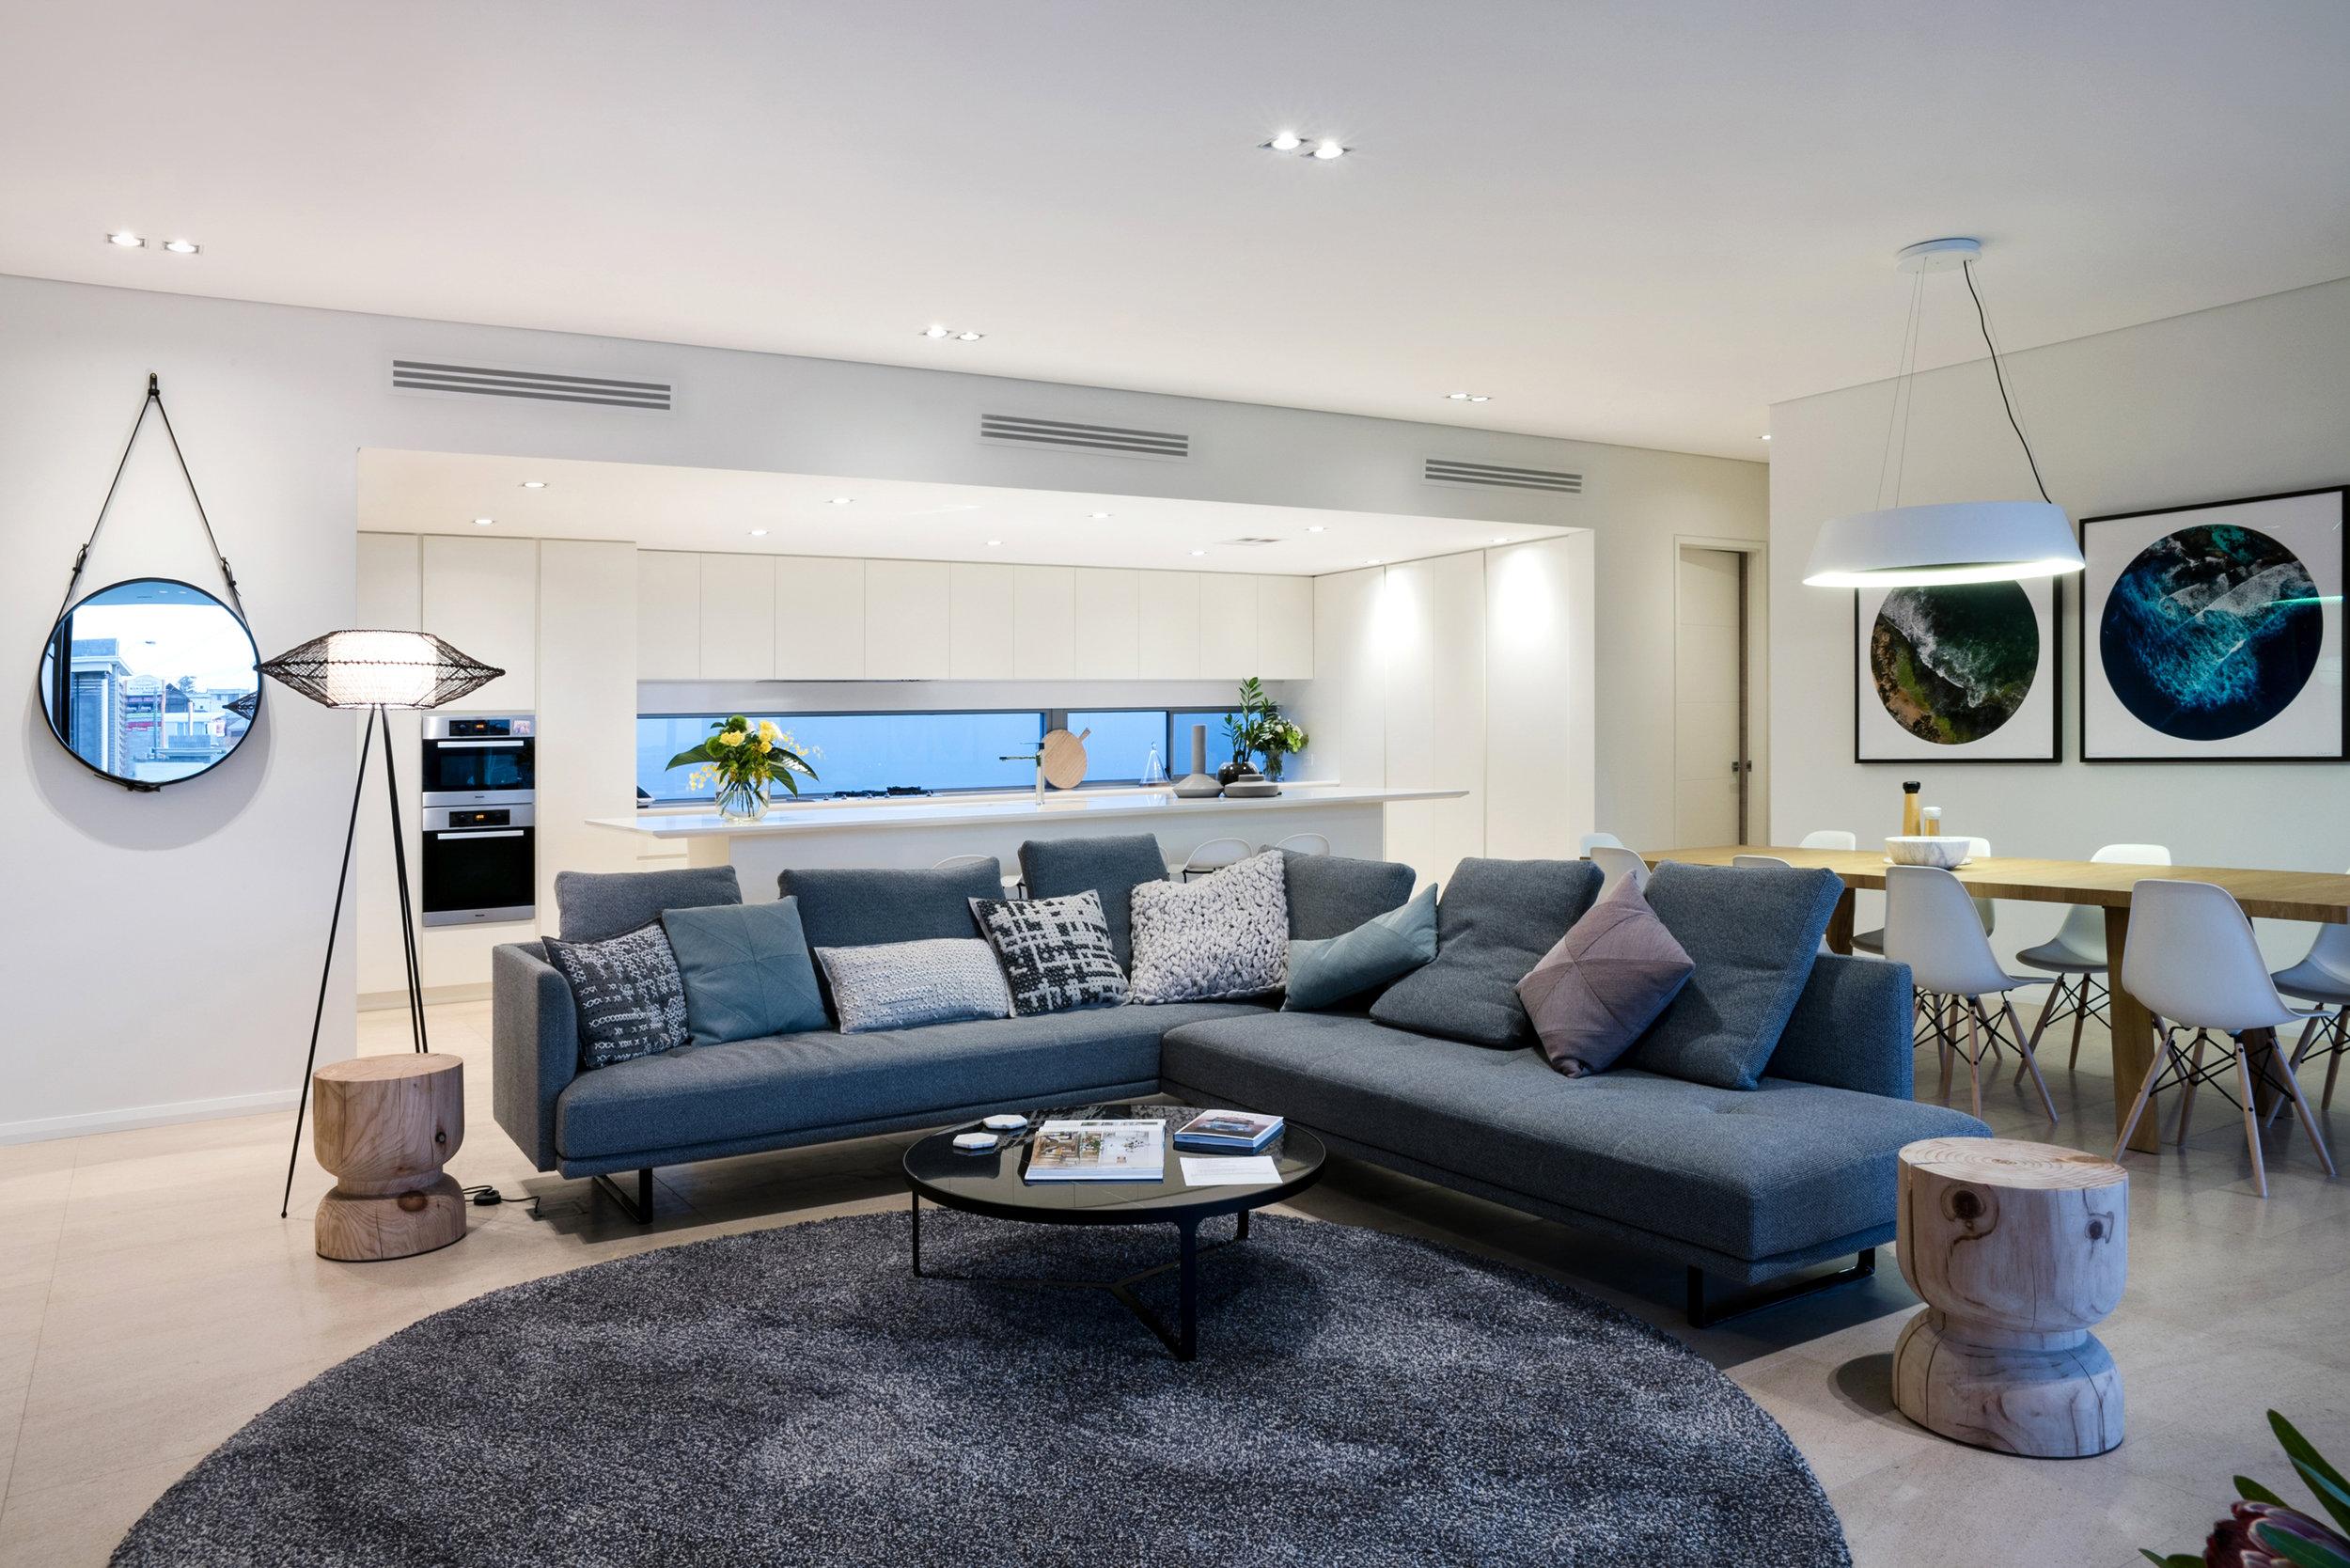 Turner_Interior_Design_North_Beach_House-004 copy.jpg